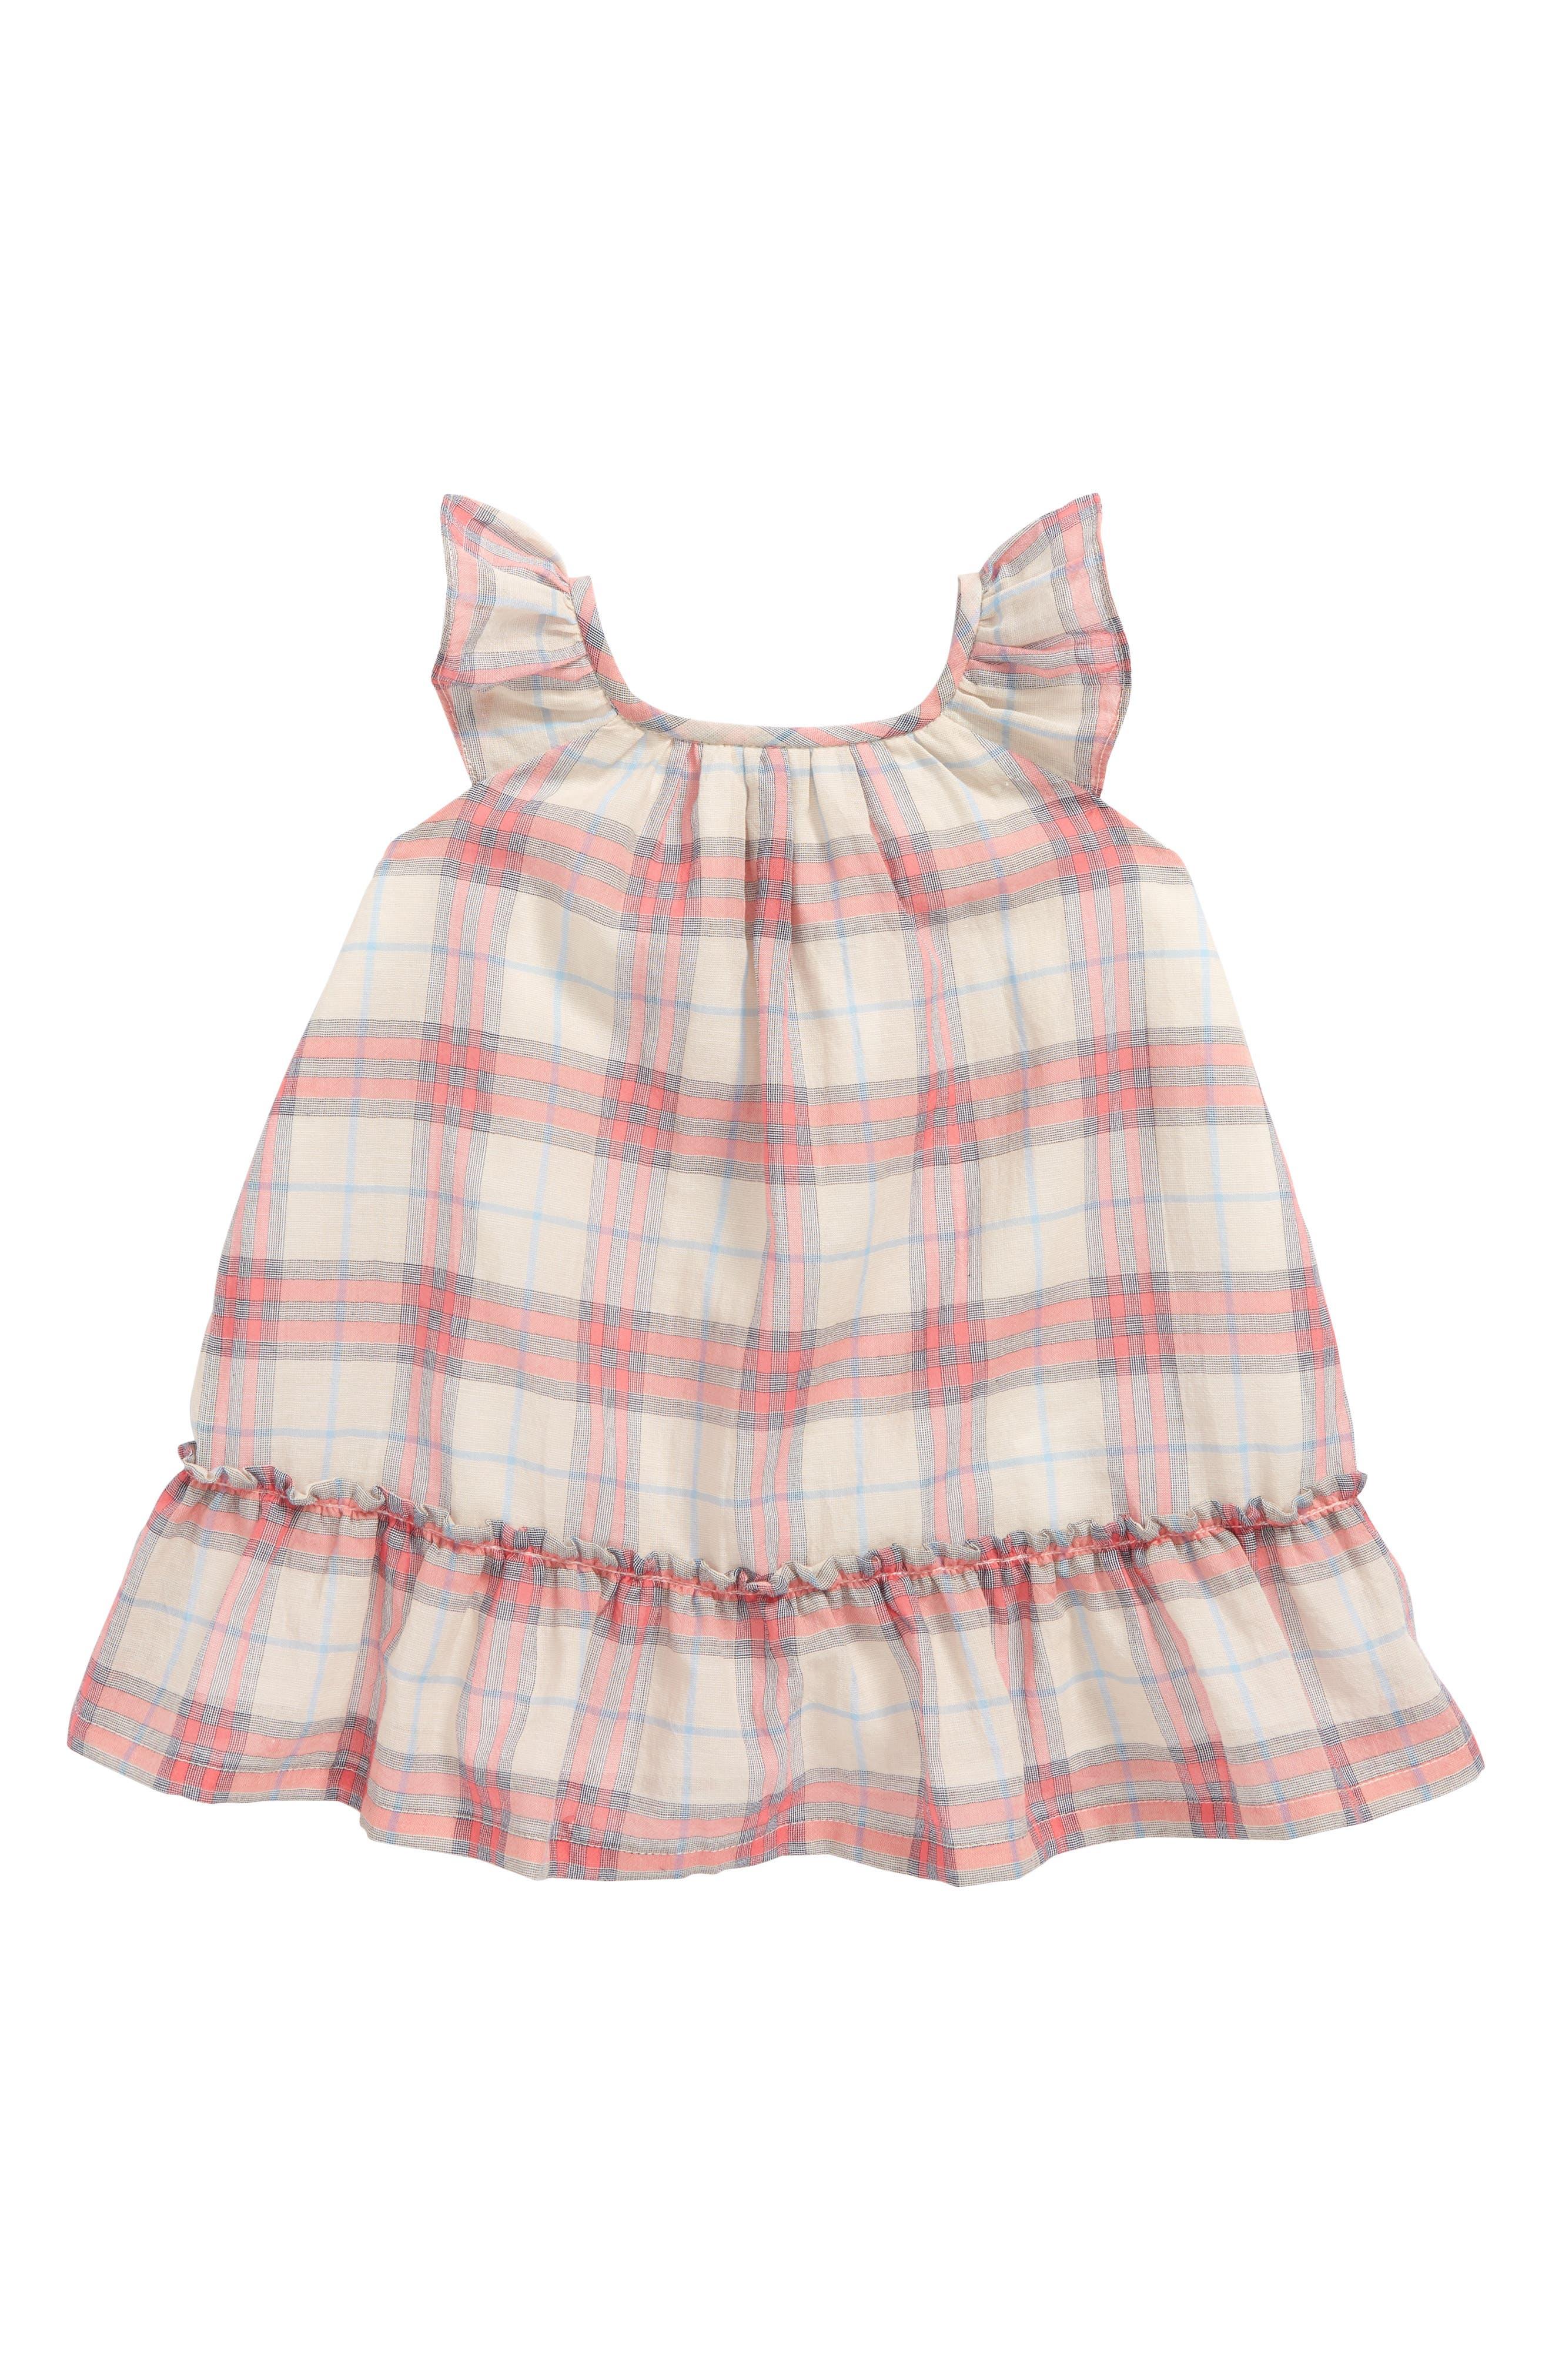 Tania Check Dress,                         Main,                         color, Bright Coral Pink